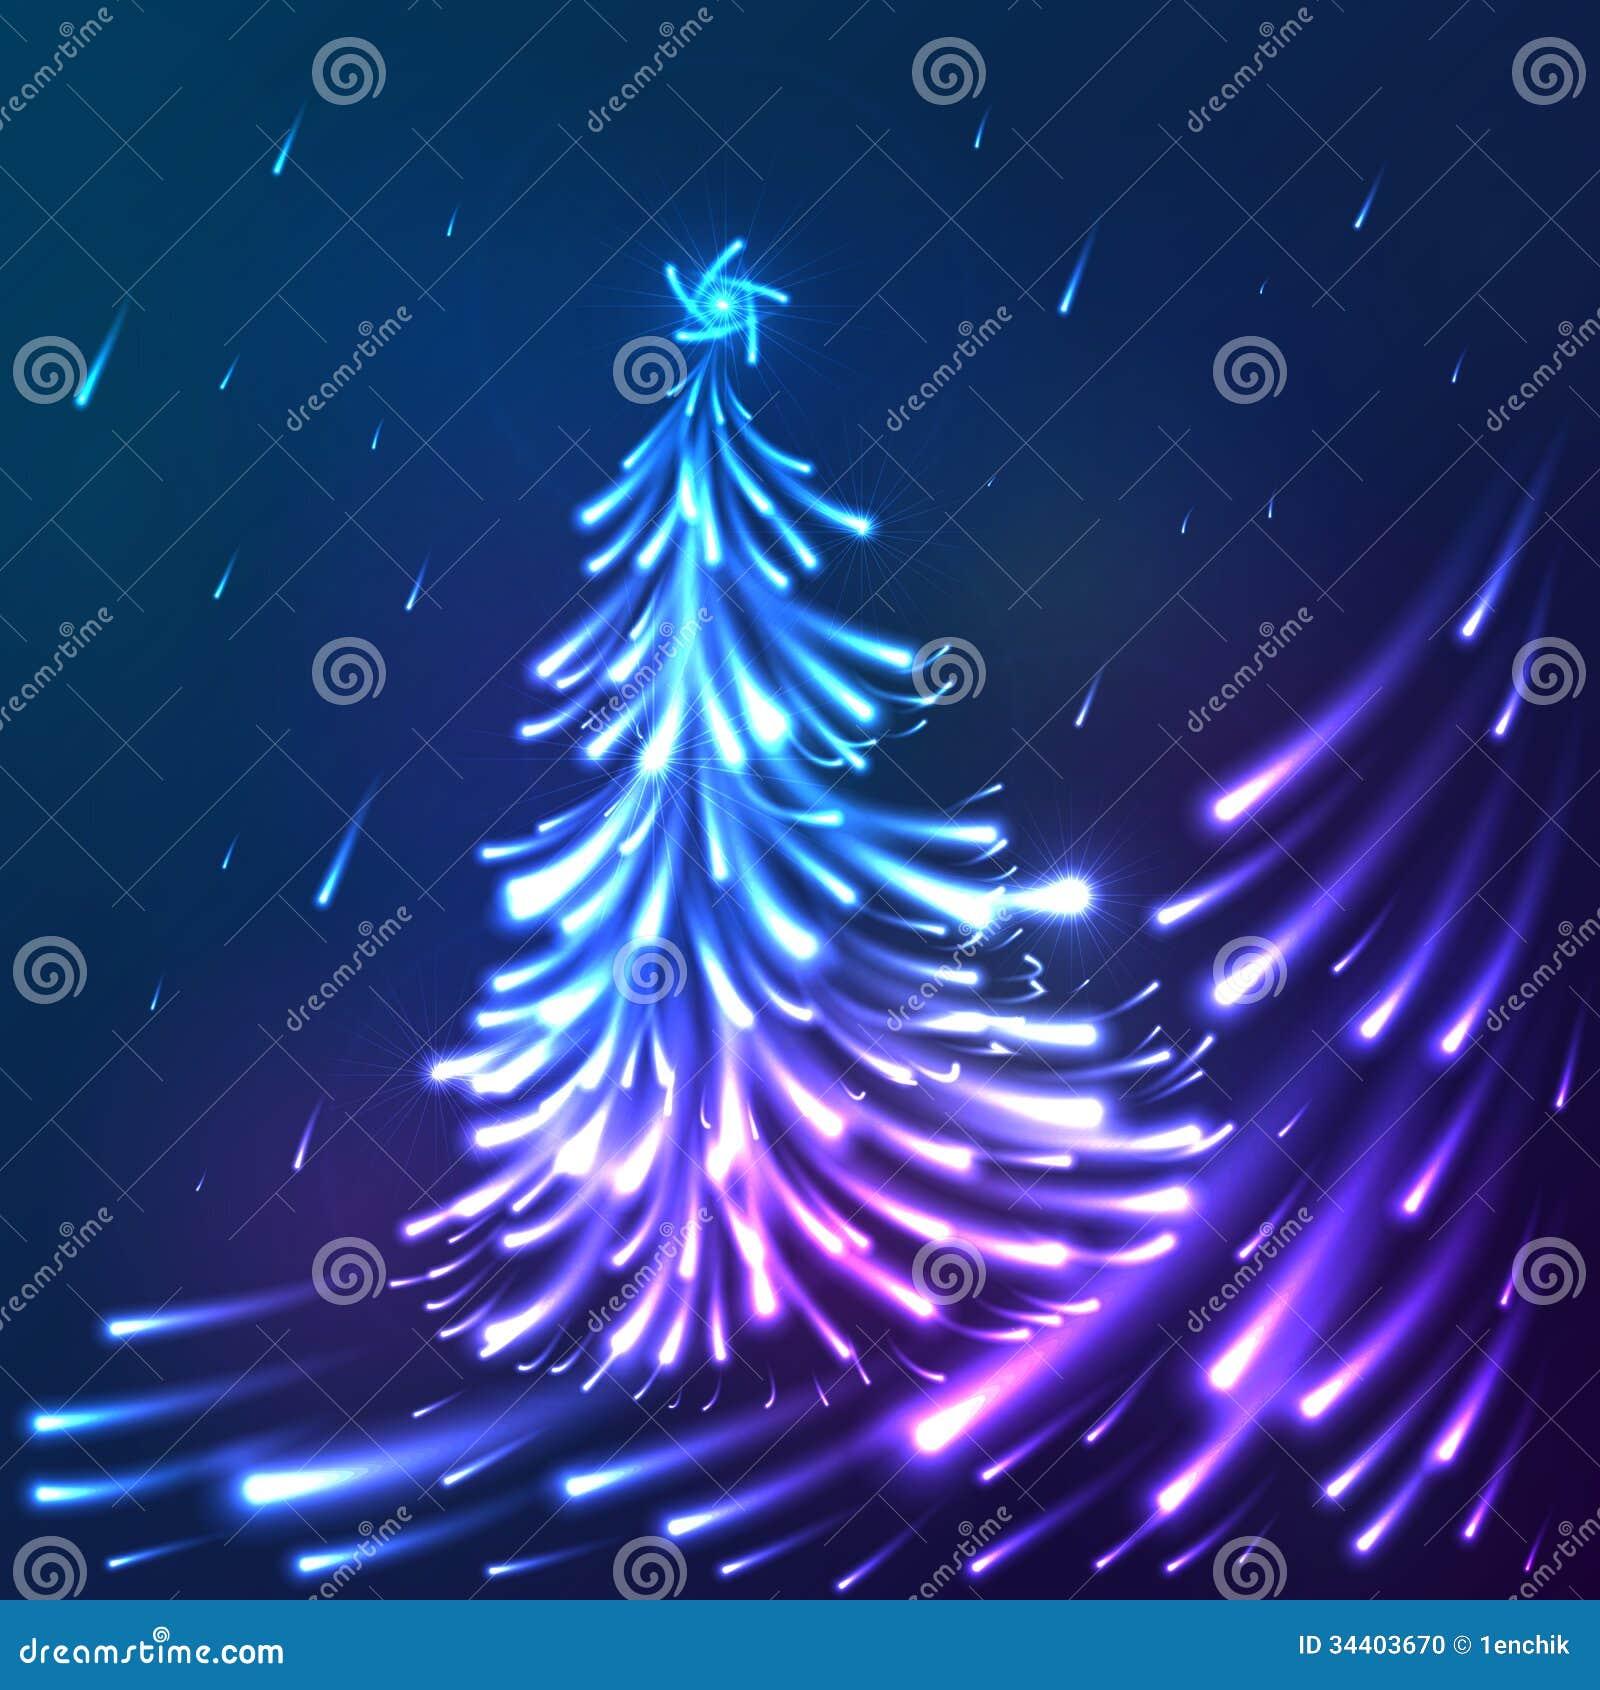 Vector Shining Lights Blue Neon Christmas Tree Stock Photo ...